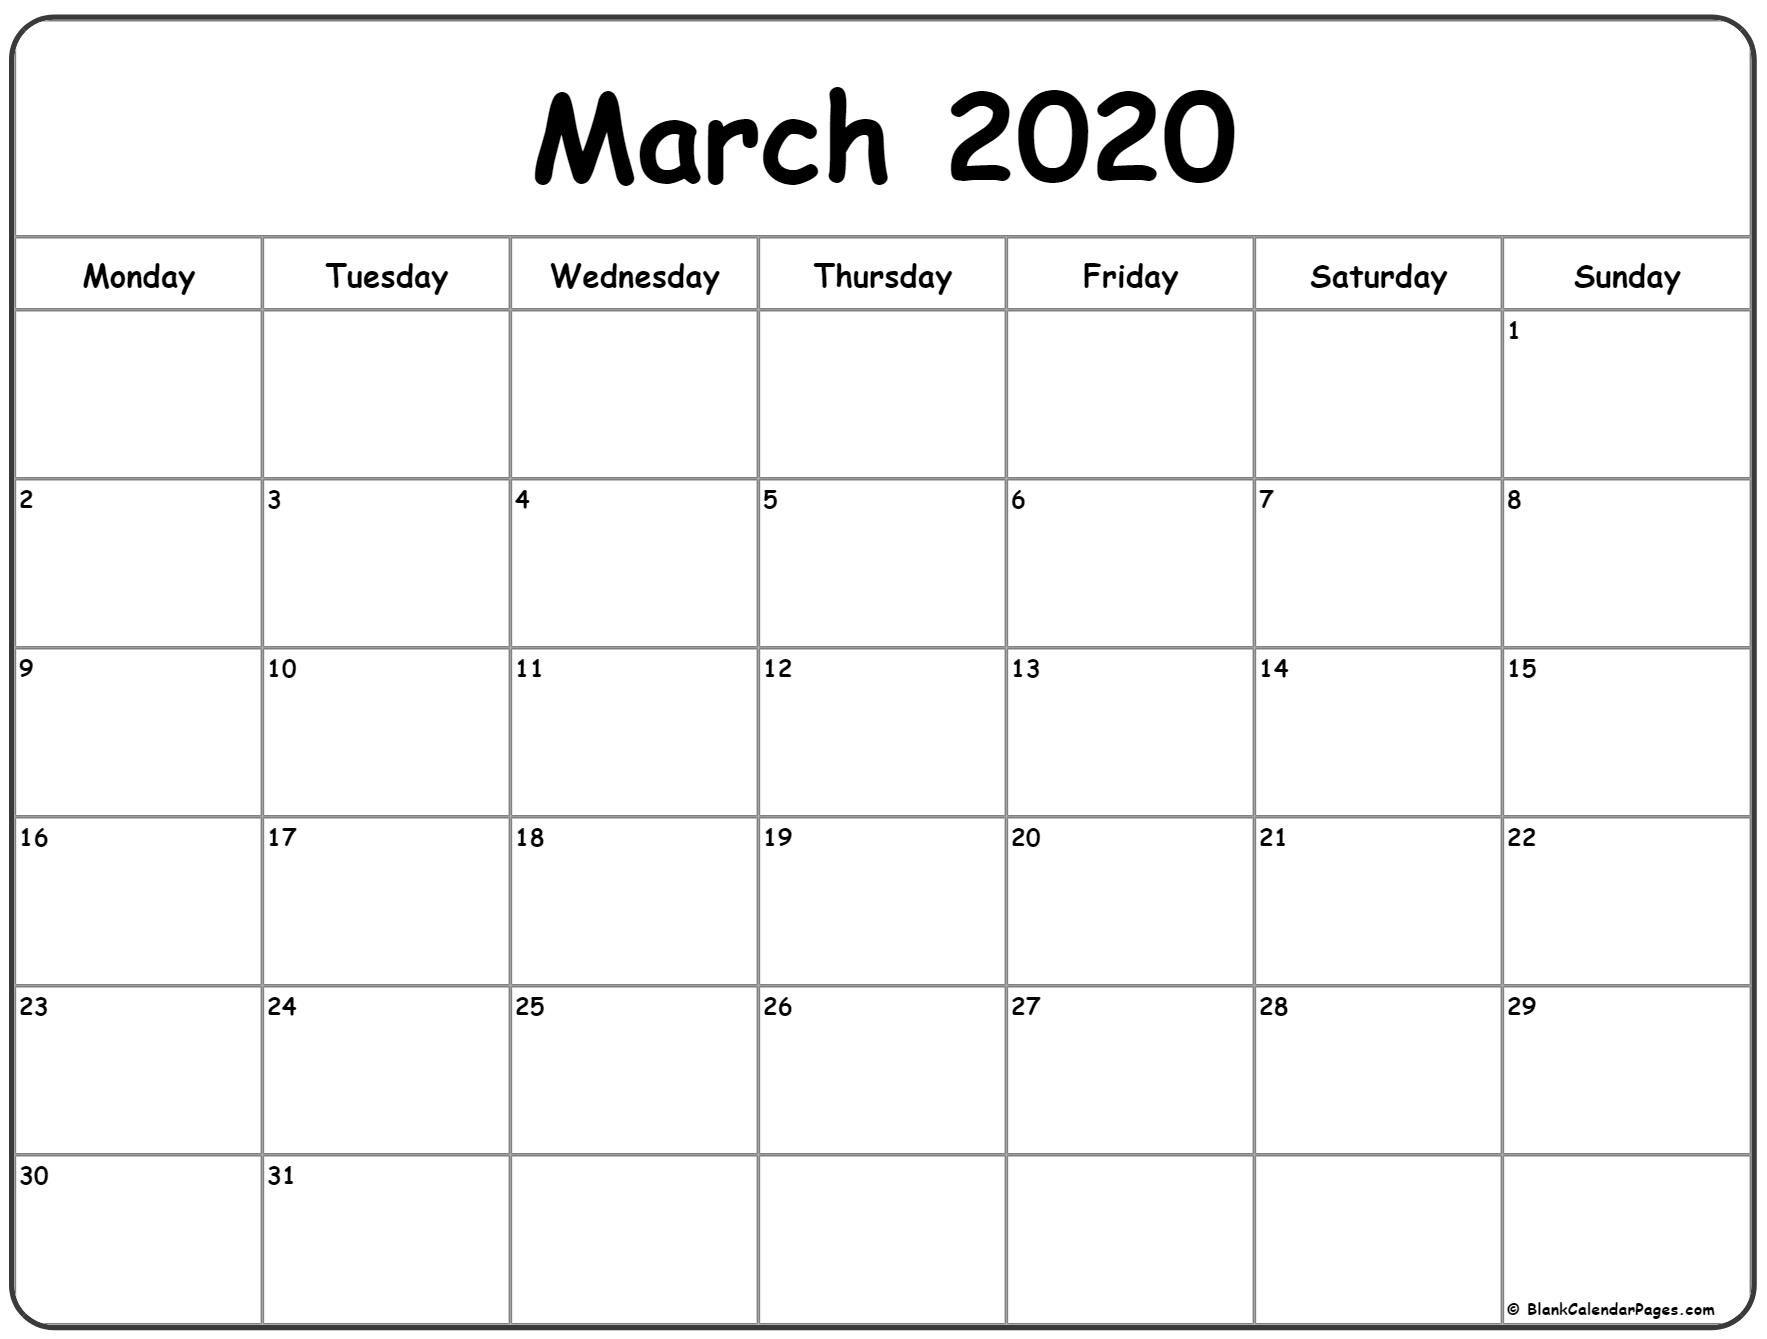 Pin On Quotes regarding Calendar 2020 Monday - Sunday